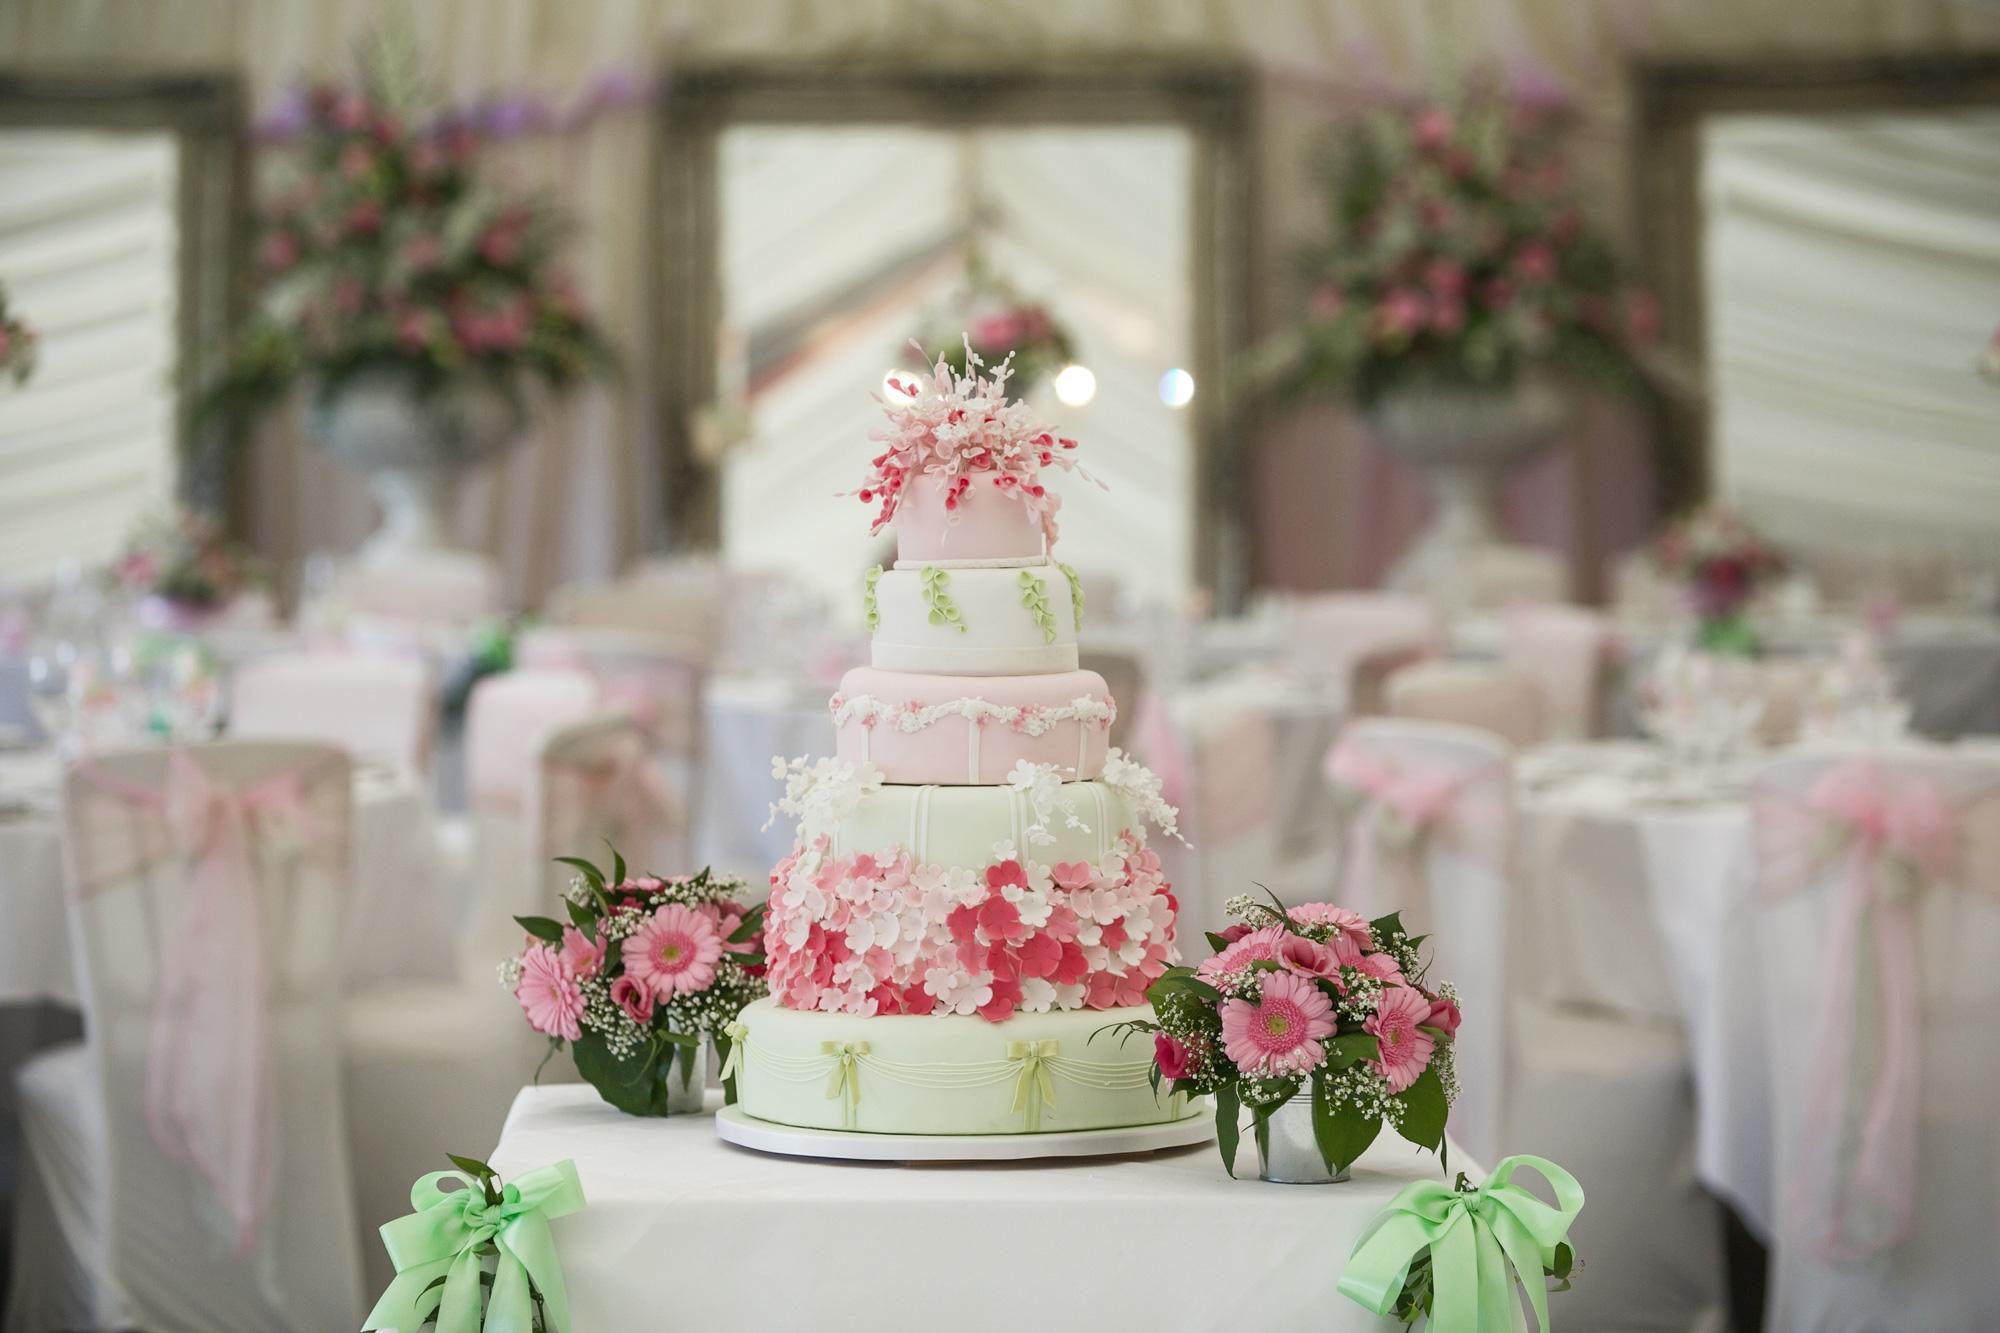 Adam_Hillier_Wedding_Photographer_Newbury_Berkshire_7 (6).jpg